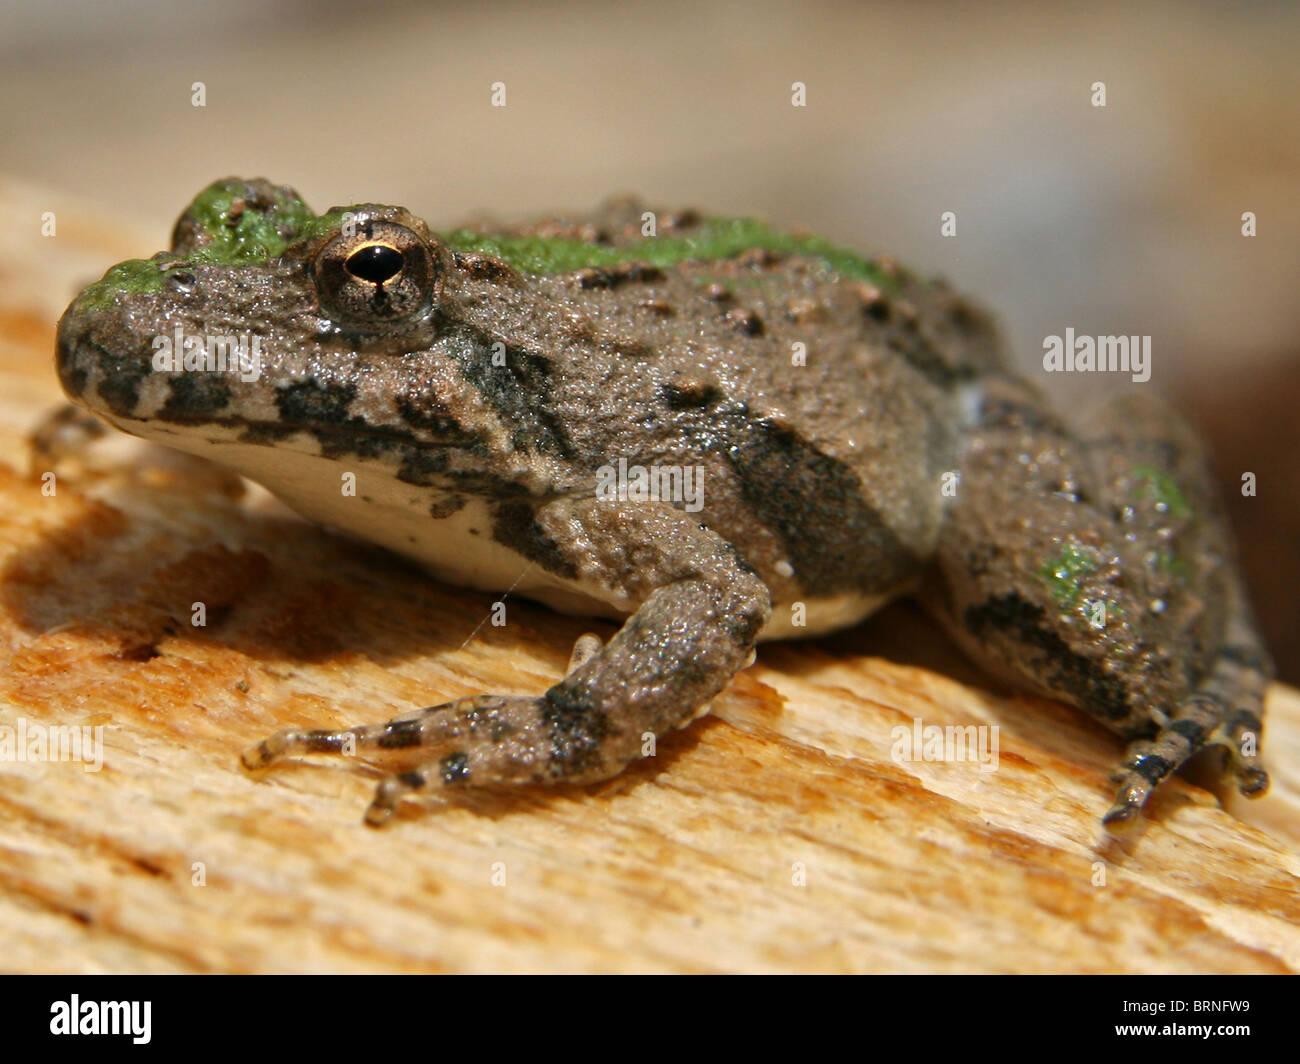 Blanchard's Cricket Frog (Acris crepitans blanchardi) Stock Photo